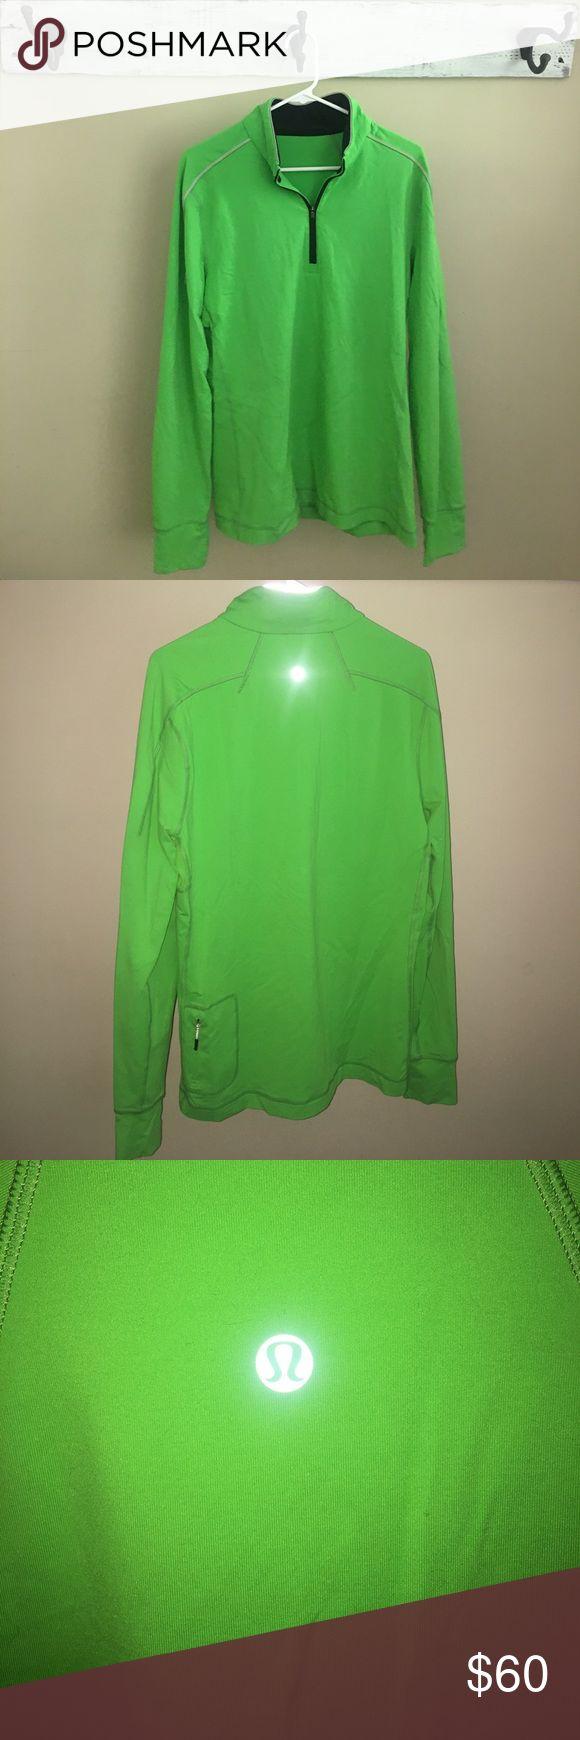 men's lululemon pullover • Men's lululemon pullover • lime green • new condition • size large • lululemon athletica Jackets & Coats Lightweight & Shirt Jackets